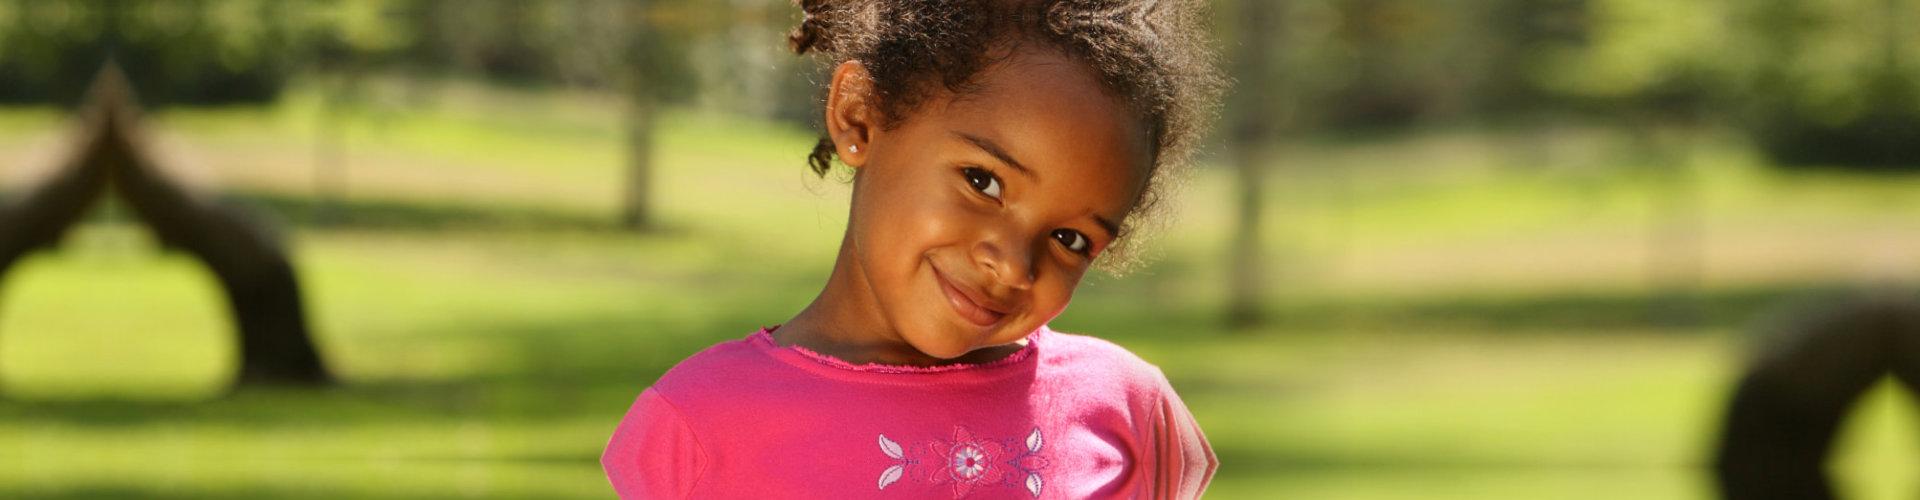 cute female kid smiling